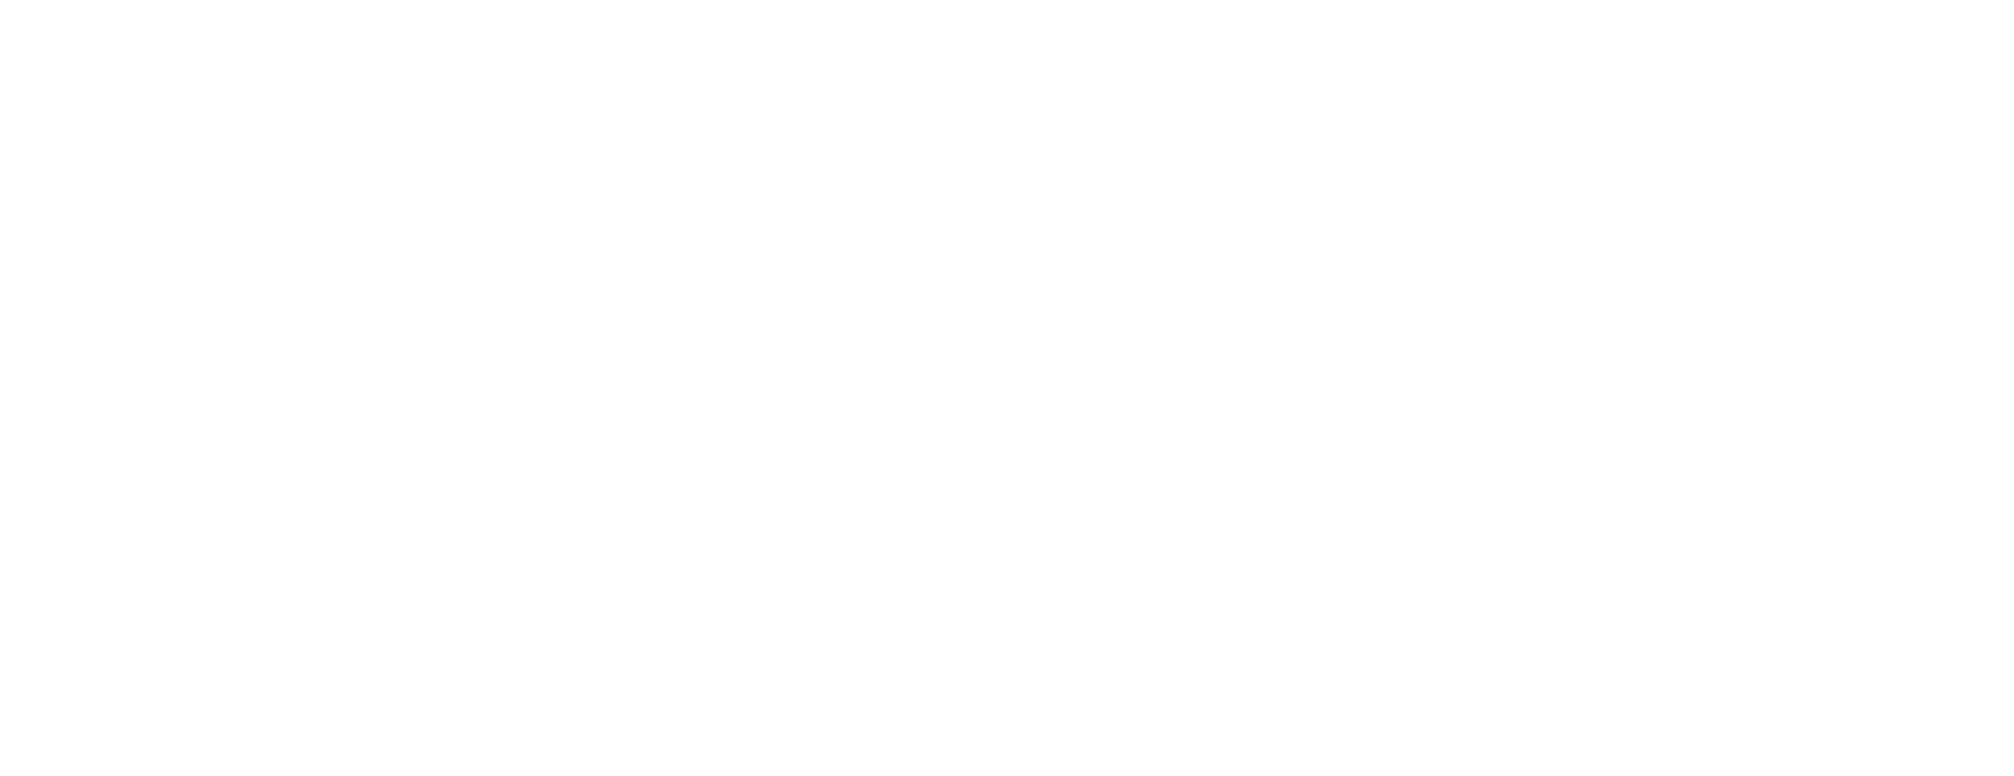 DAC Design Architecture & Construction